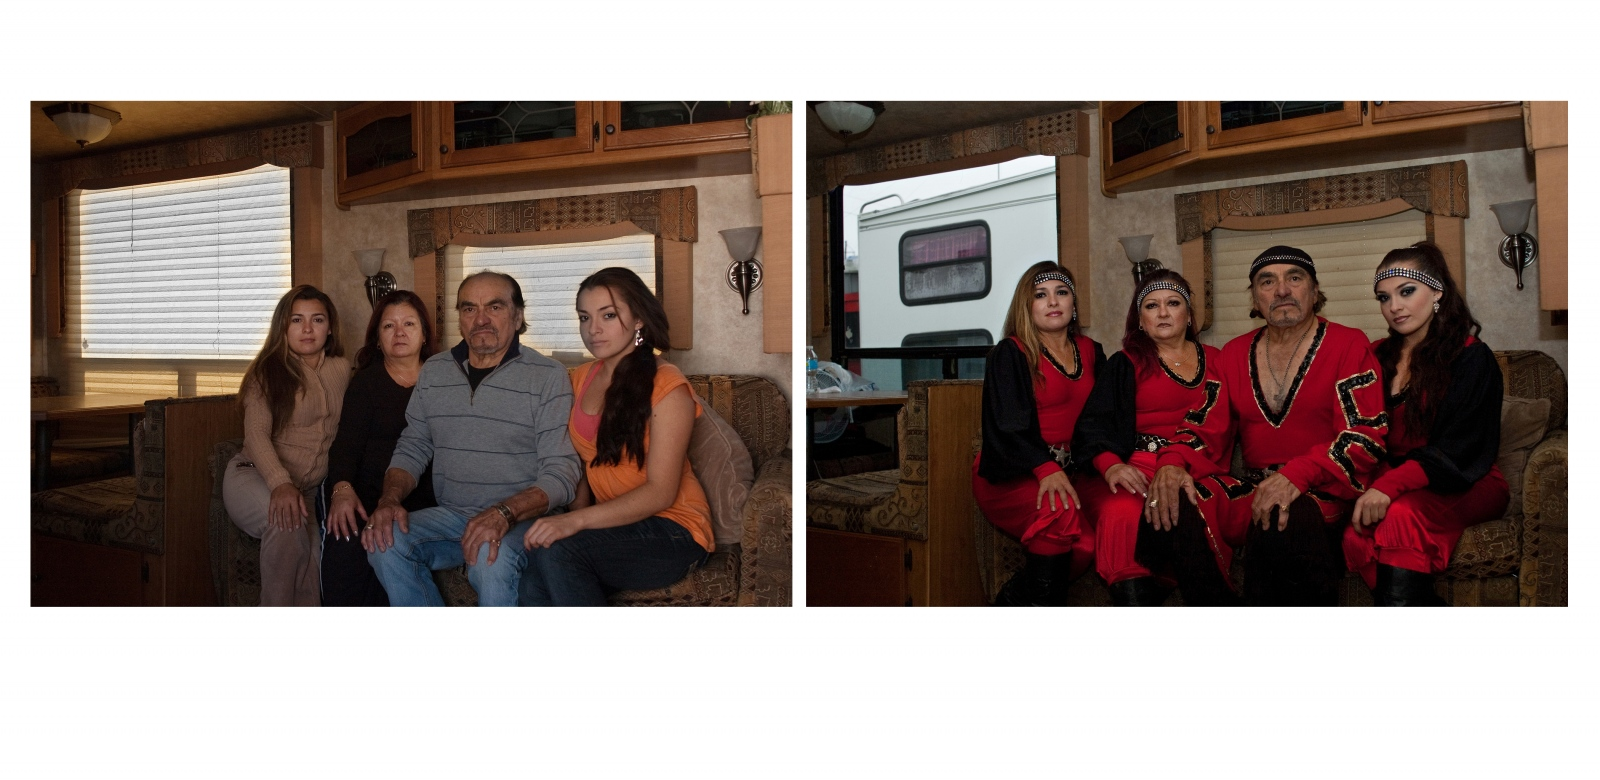 Art and Documentary Photography - Loading 11.double_take_Fusco_family.jpg